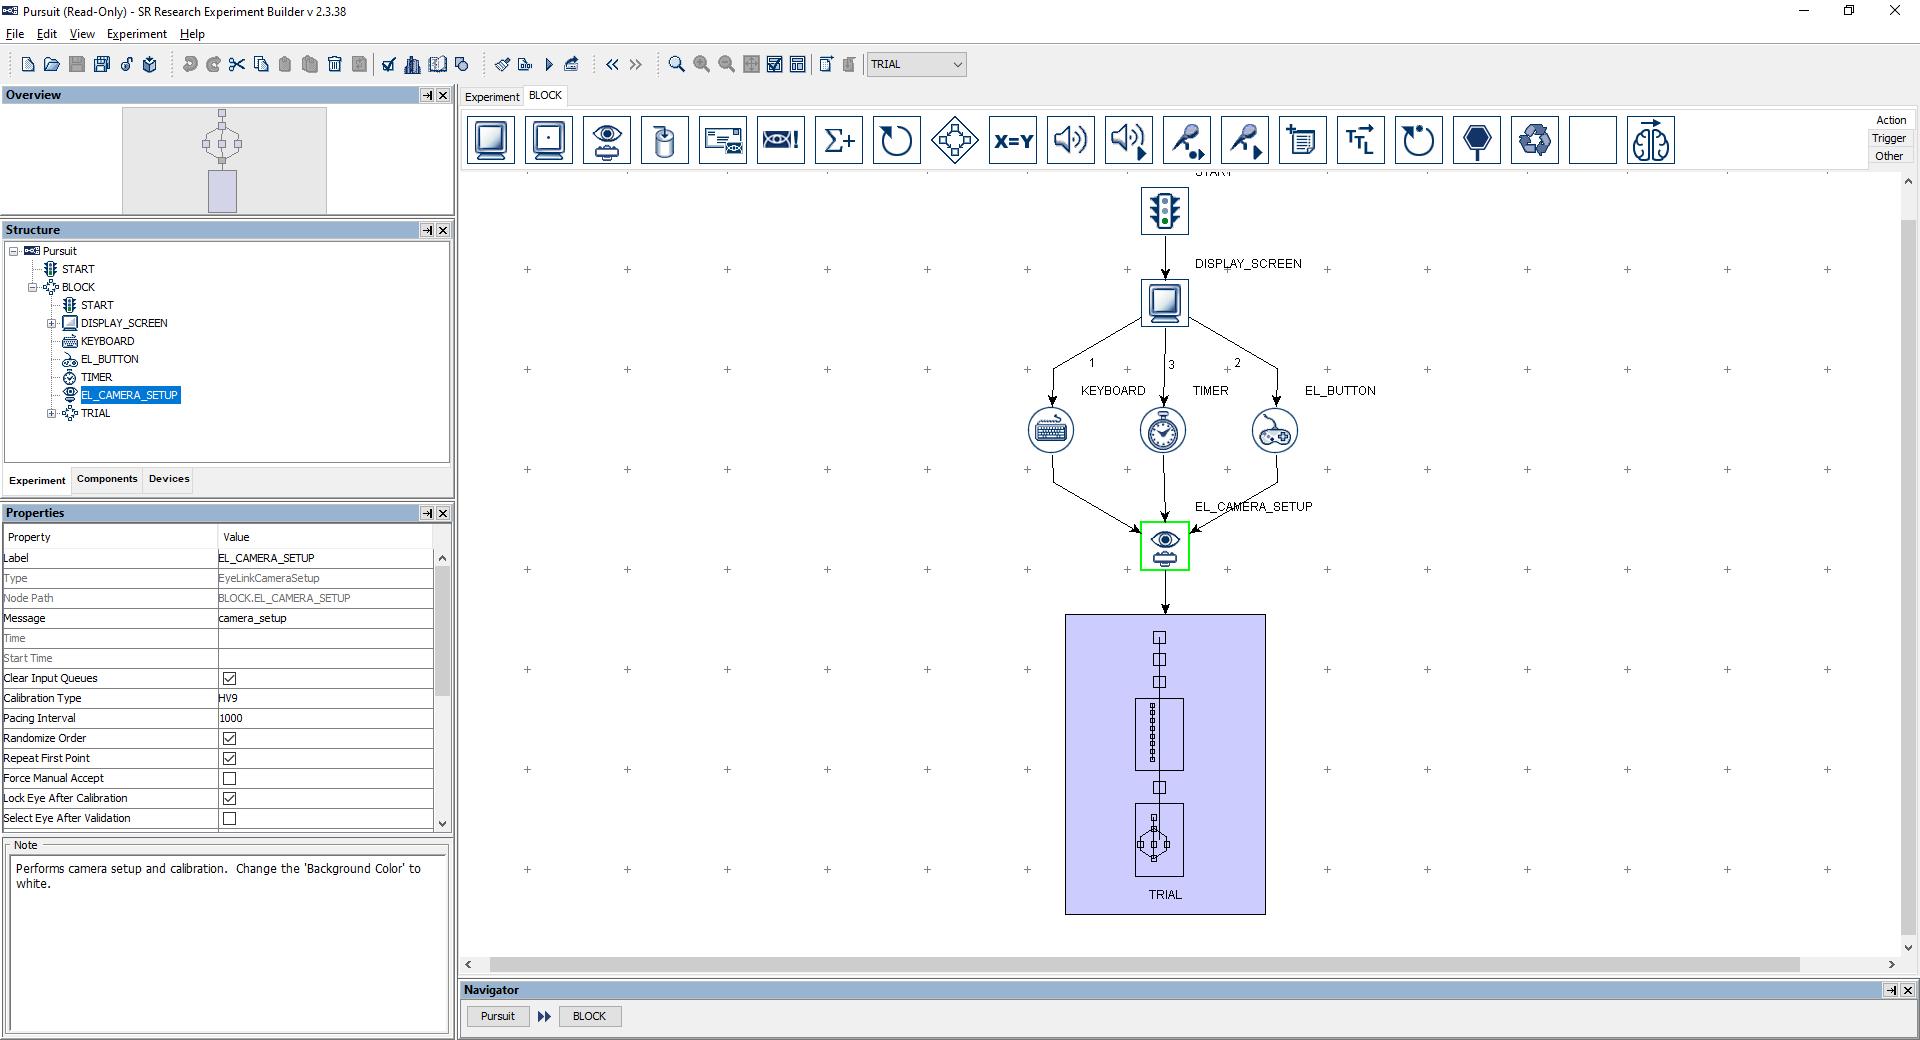 Experiment Builder Eye Tracking Software - EyeLink